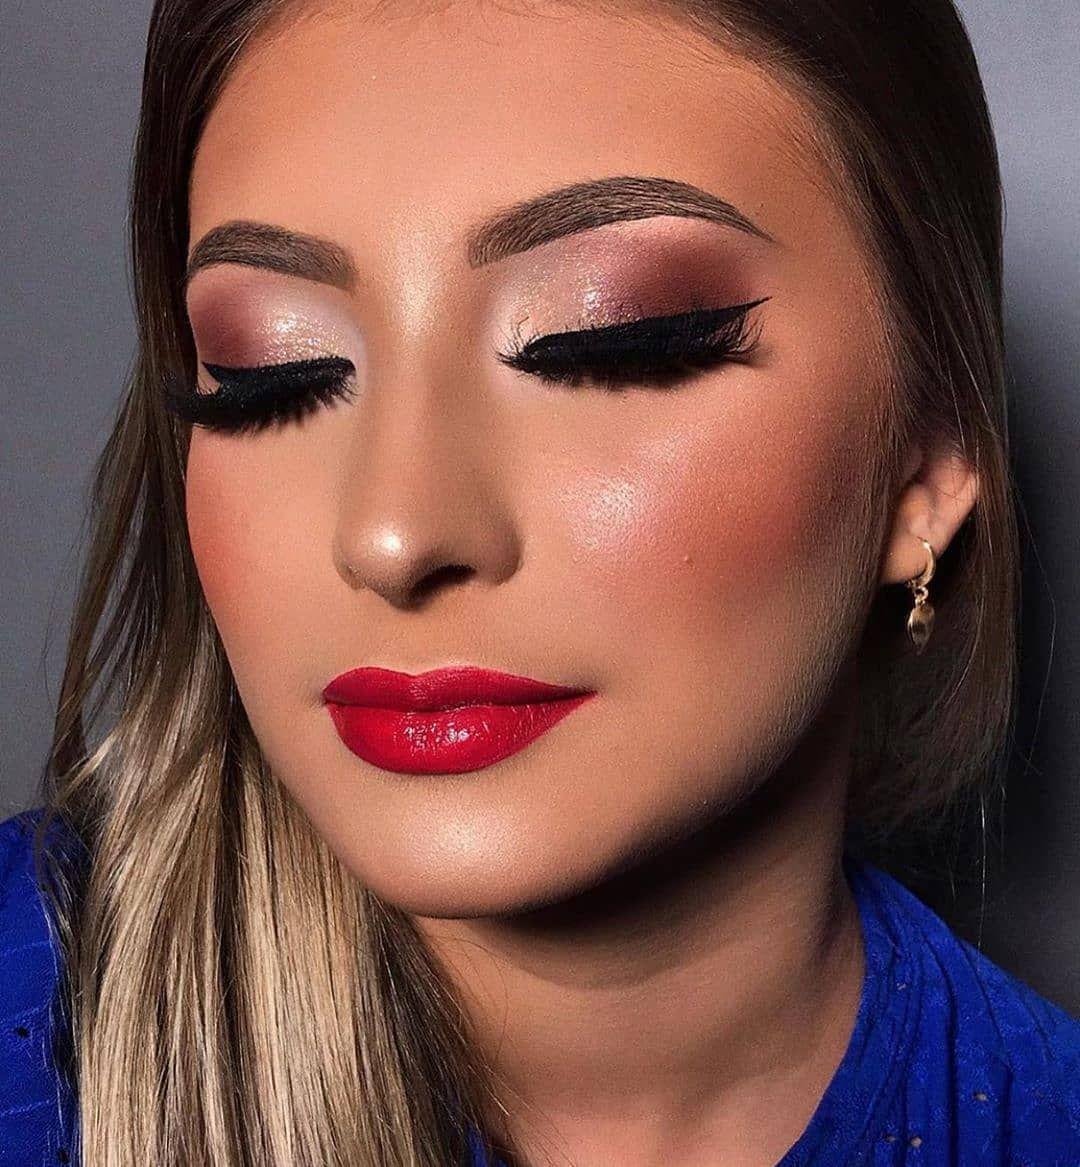 Makeup in 2020 Liquid glitter eyeshadow, Glitter eye